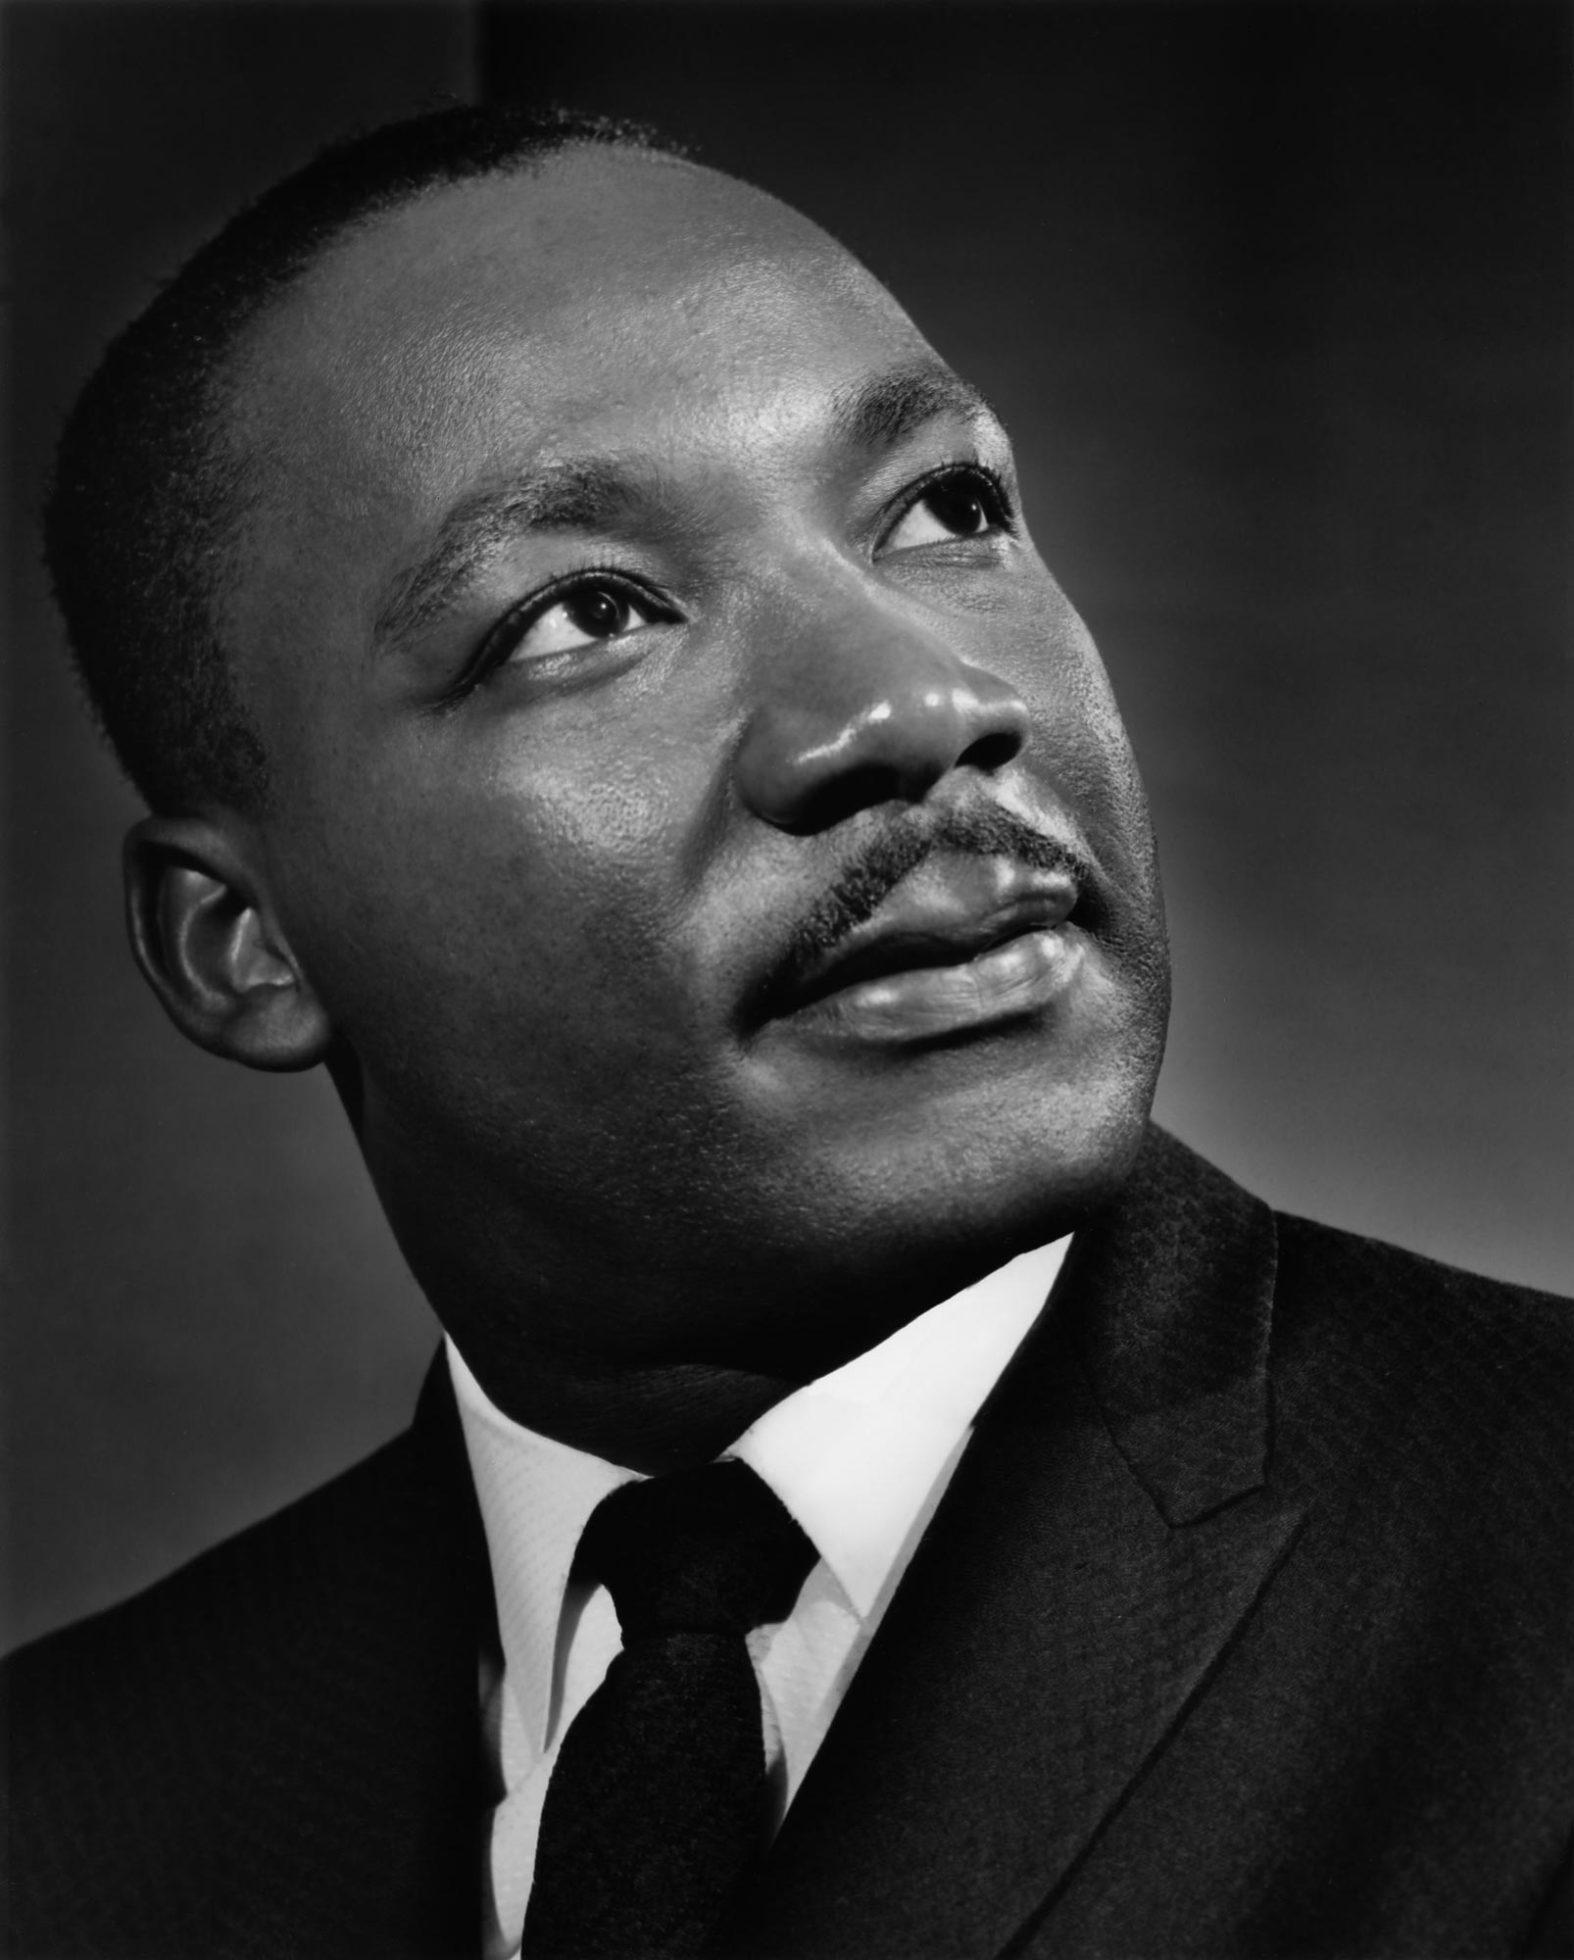 Martin Luther King Yousuf Karsh